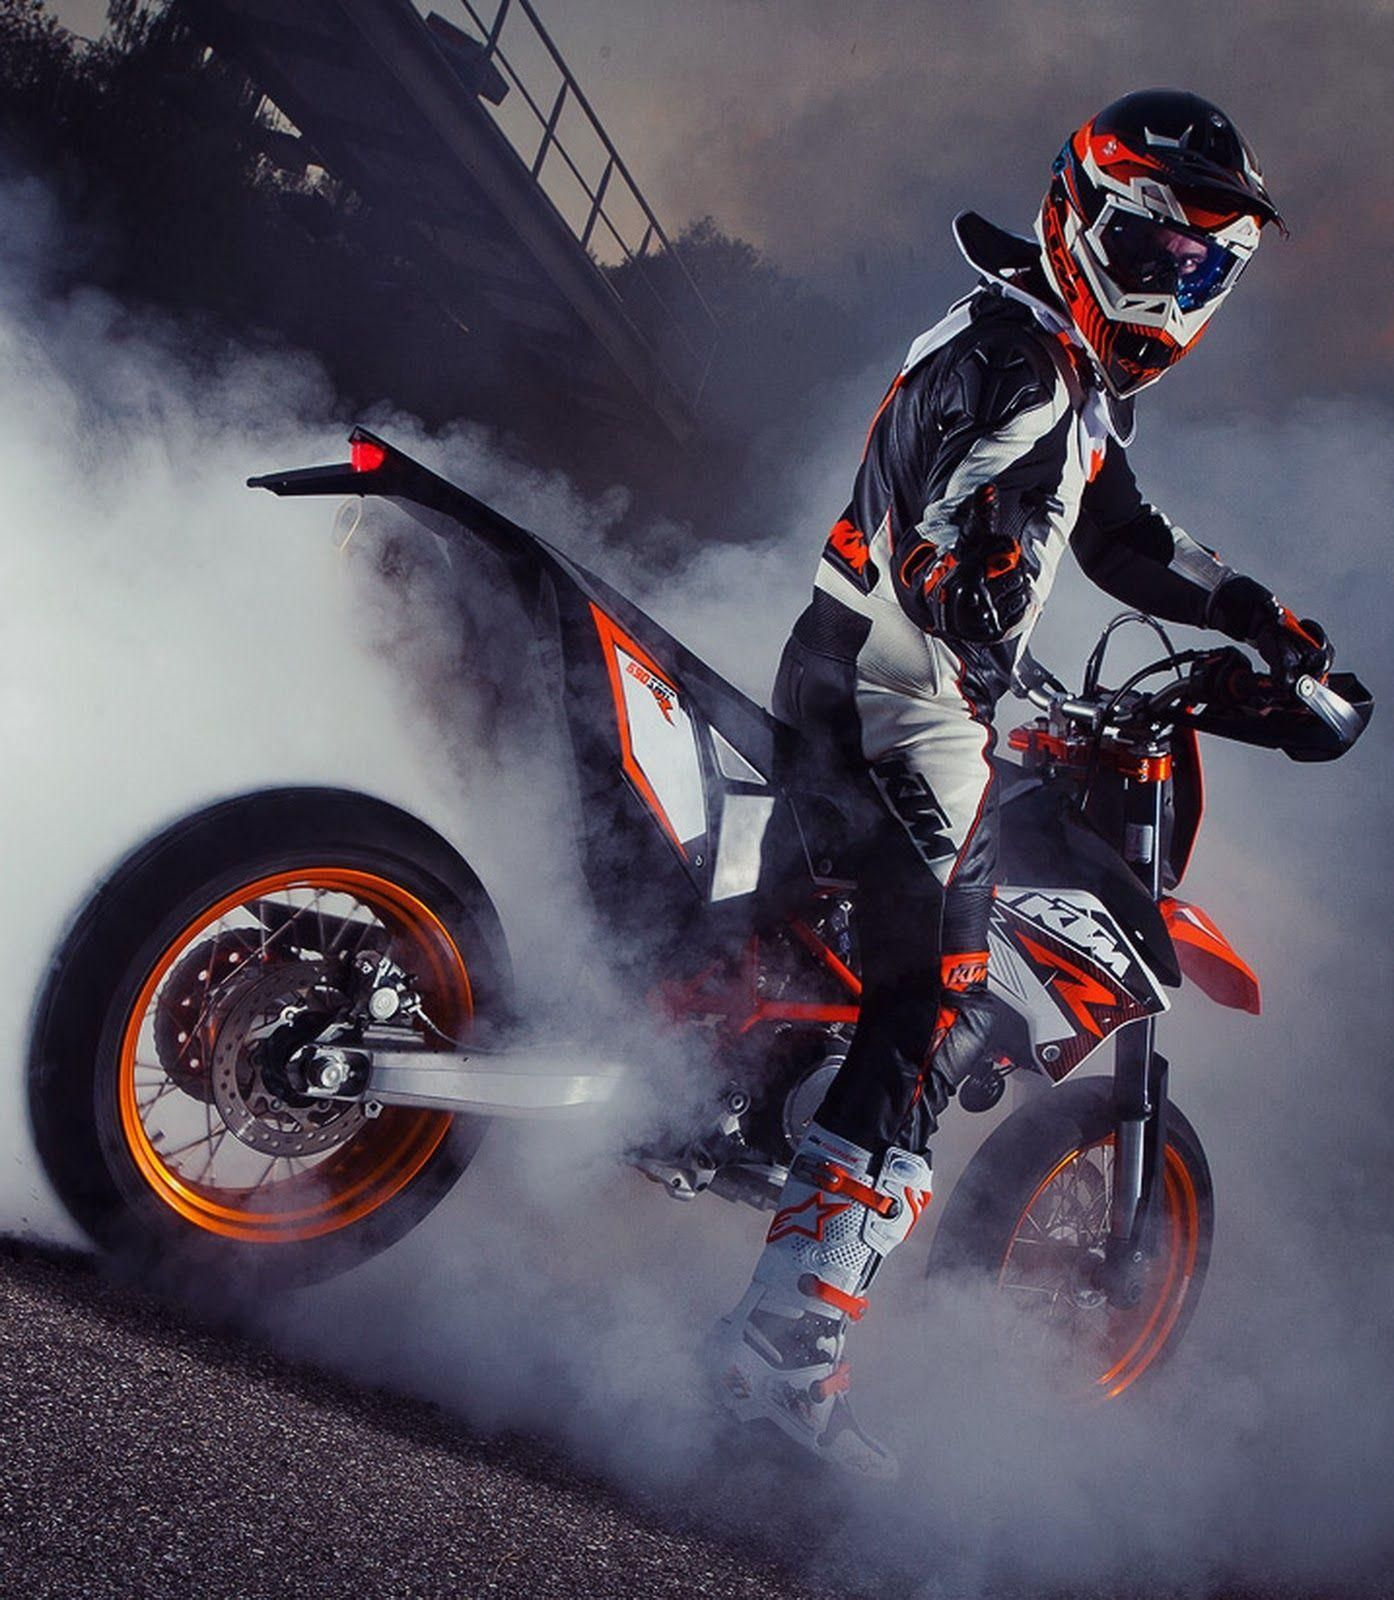 Wallpaper Motocross 4k Celular Ktm Supermoto Supermoto Motocross Love